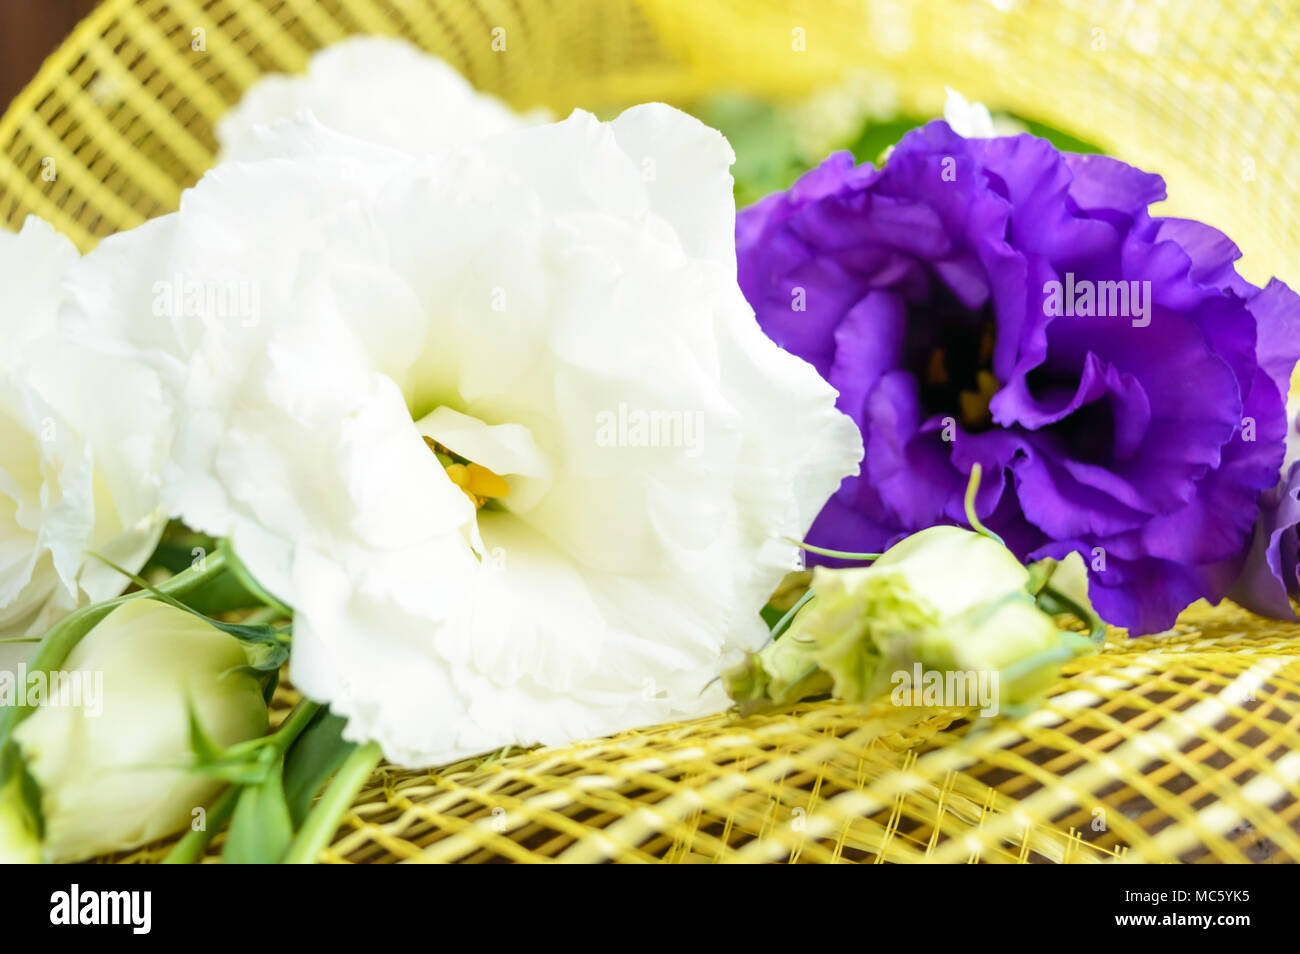 Freshly picked white and purple flowers eustomy (lisianthus)  on the wooden background. Close up - Stock Image